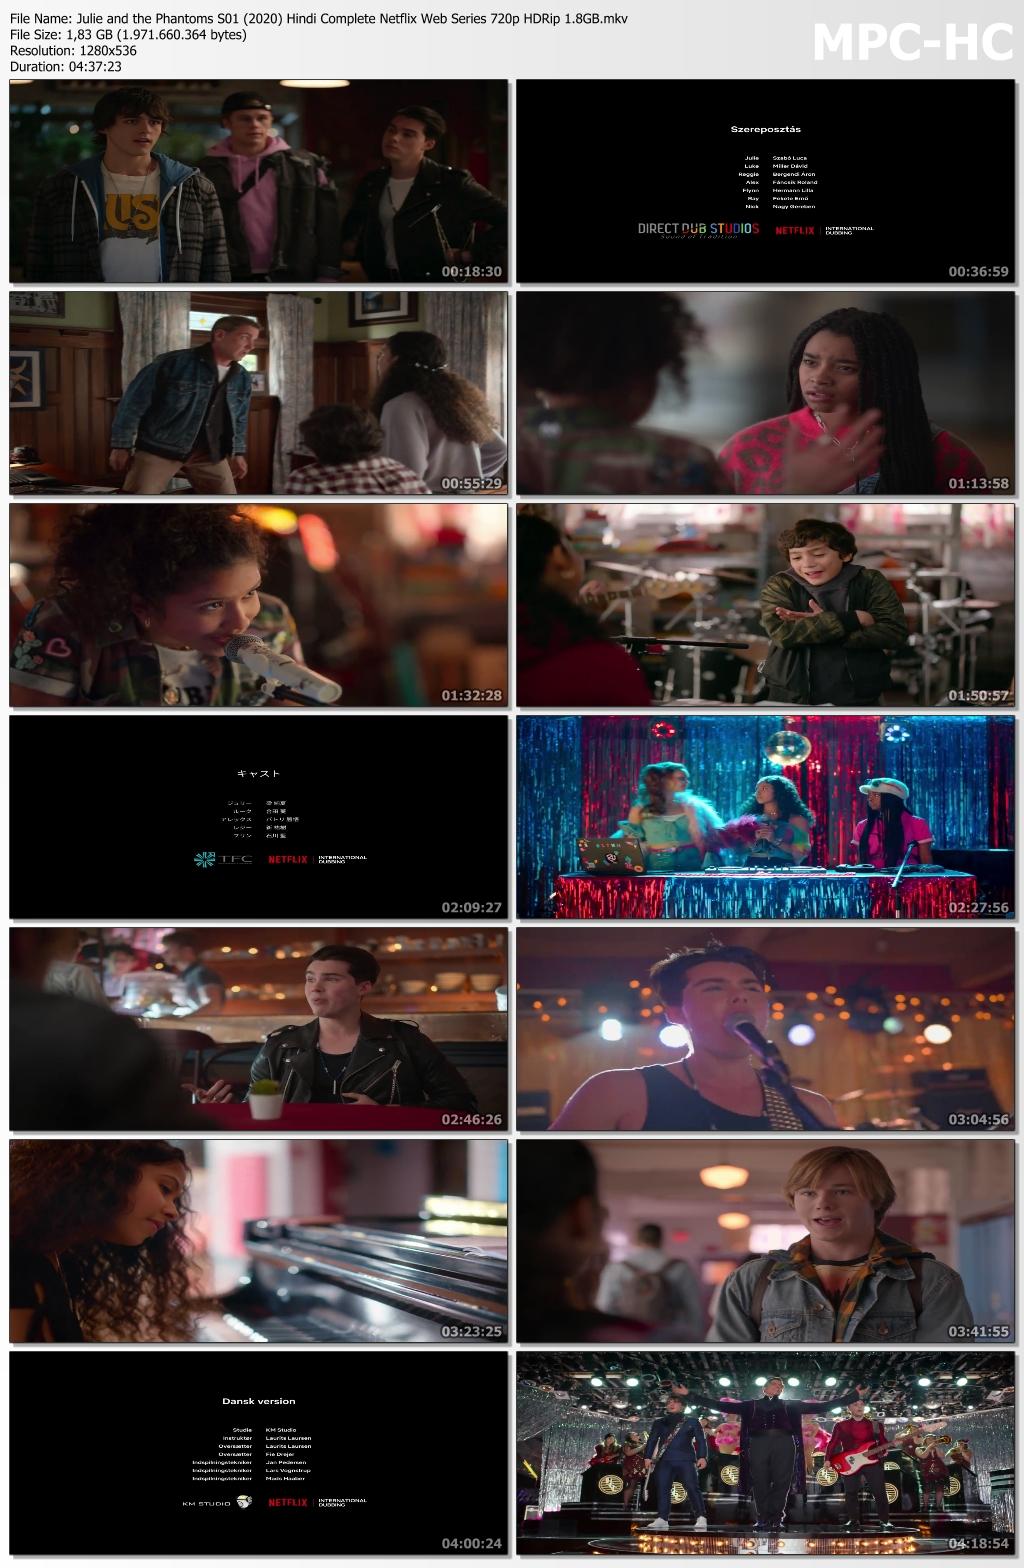 Julie-and-the-Phantoms-S01-2020-Hindi-Complete-Netflix-Web-Series-720p-HDRip-1-8-GB-mkv-thumbs